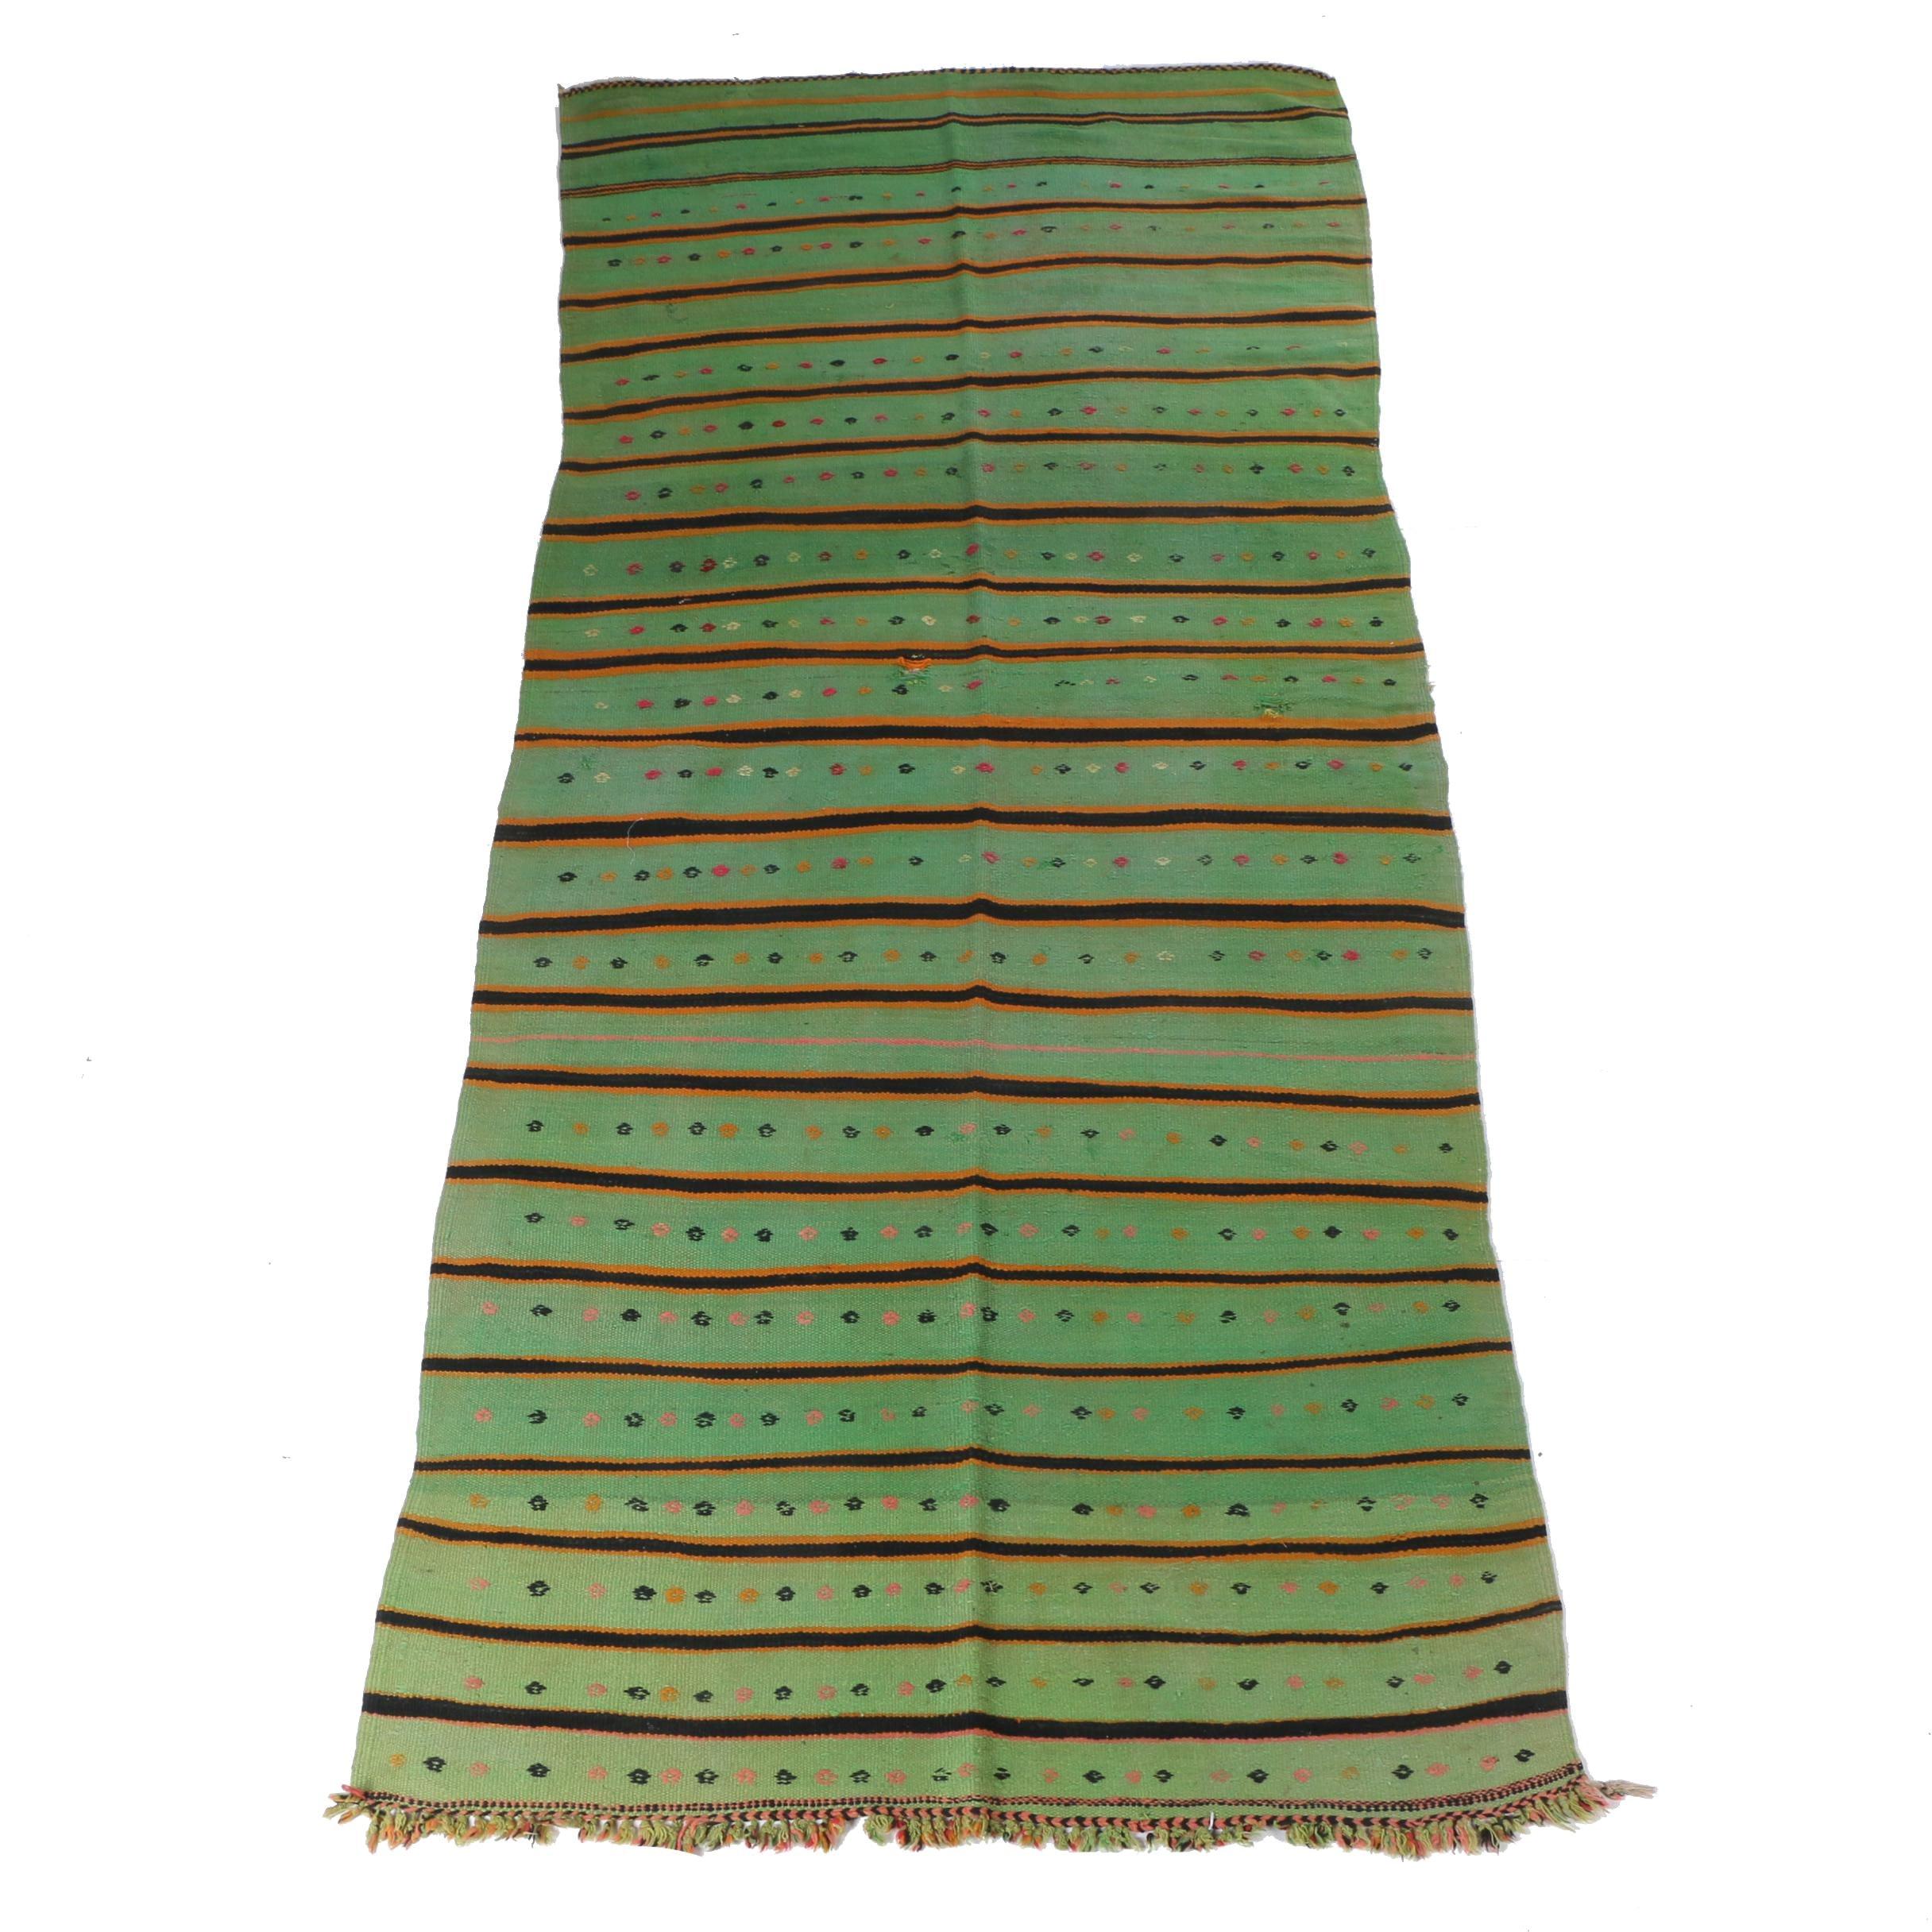 Handwoven and Embroidered Blue Ocean Traders Berber Wool Rug/Blanket